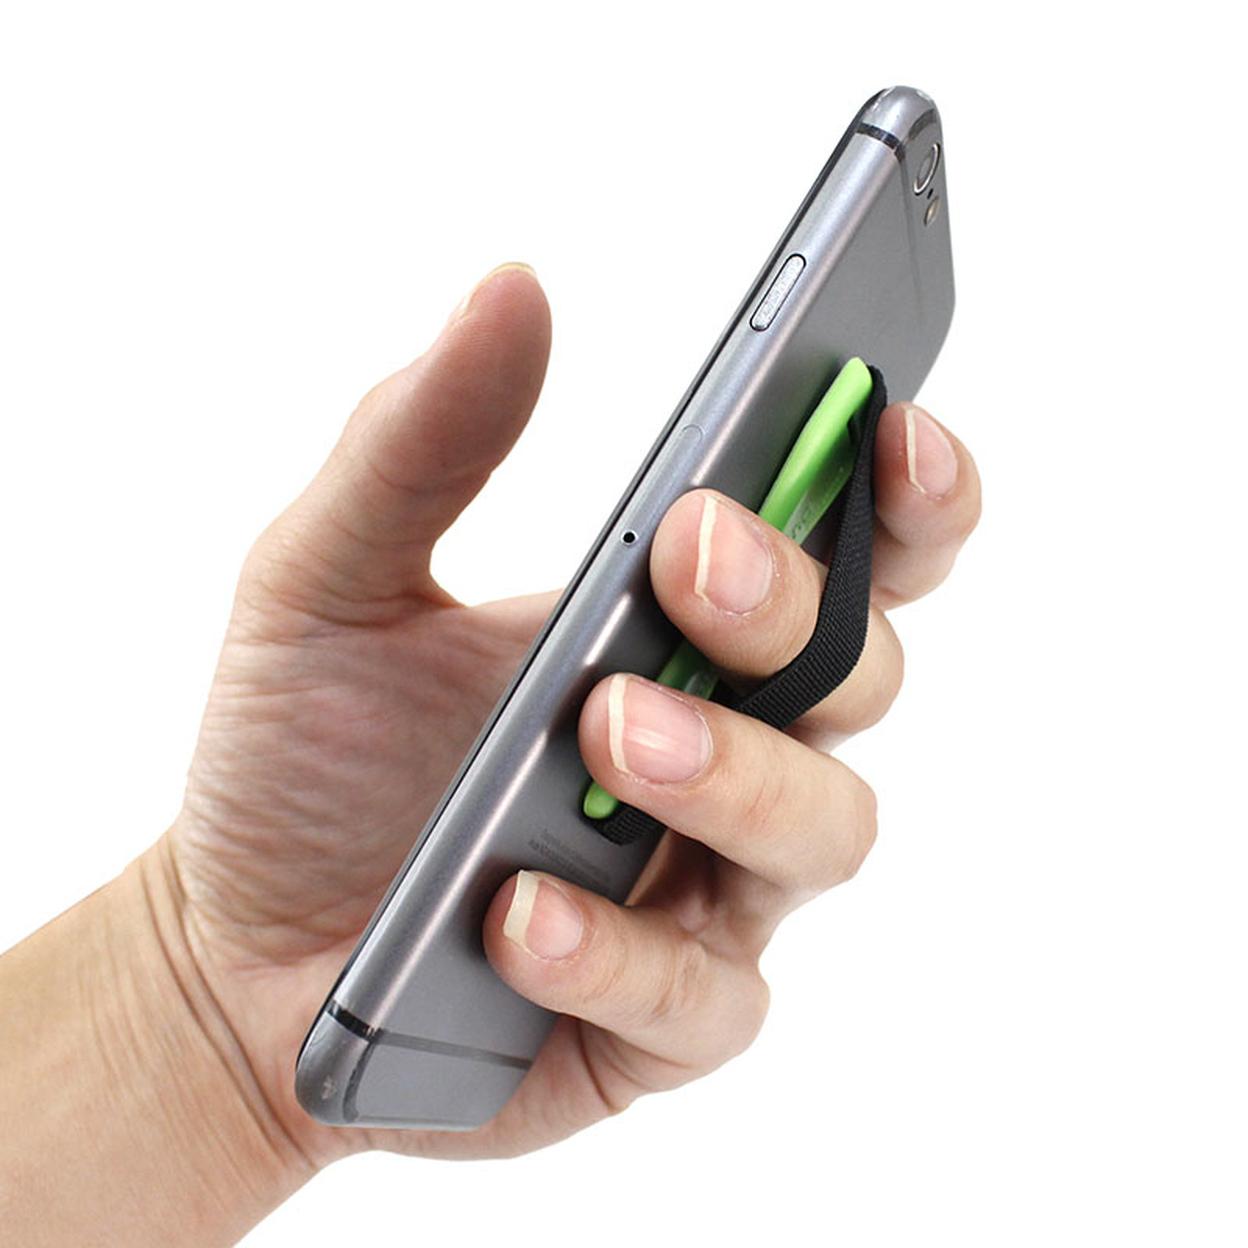 Grip Your Phone- 3 pack *sale* - red 568aae3a8d3d6f197e8b49ec